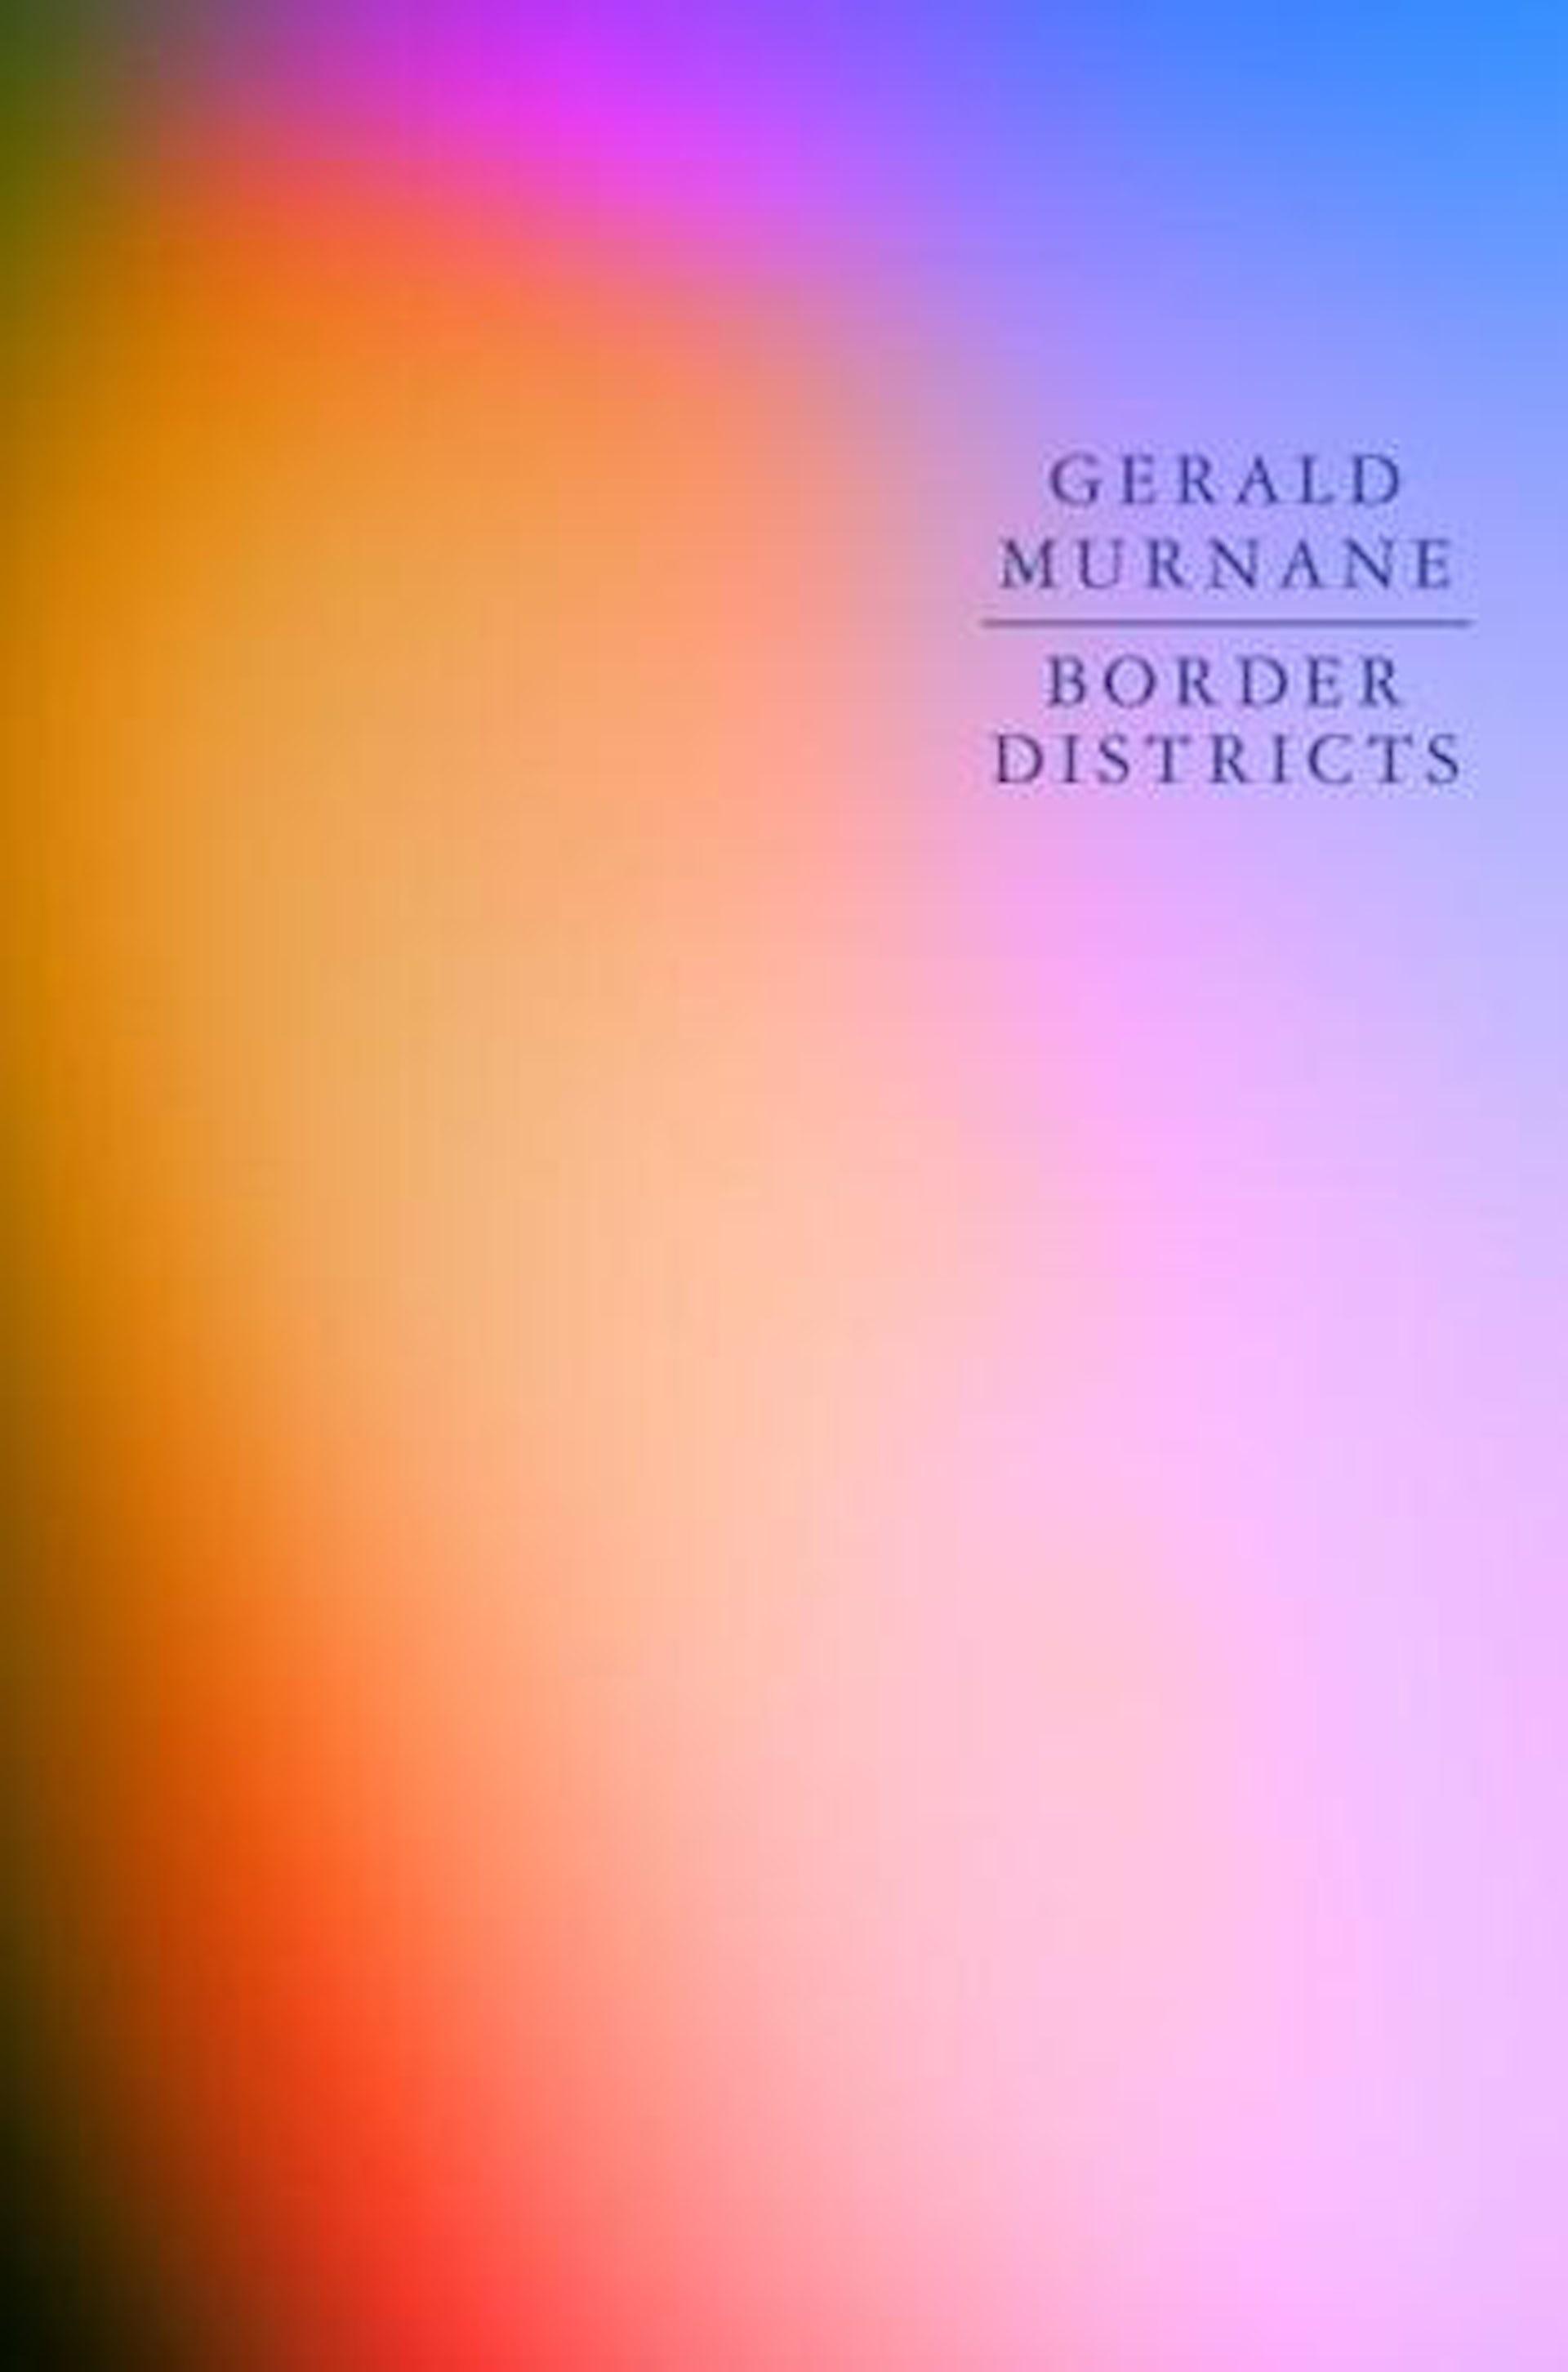 Gerald Murnane's Prime Minister's Literary award is long overdue